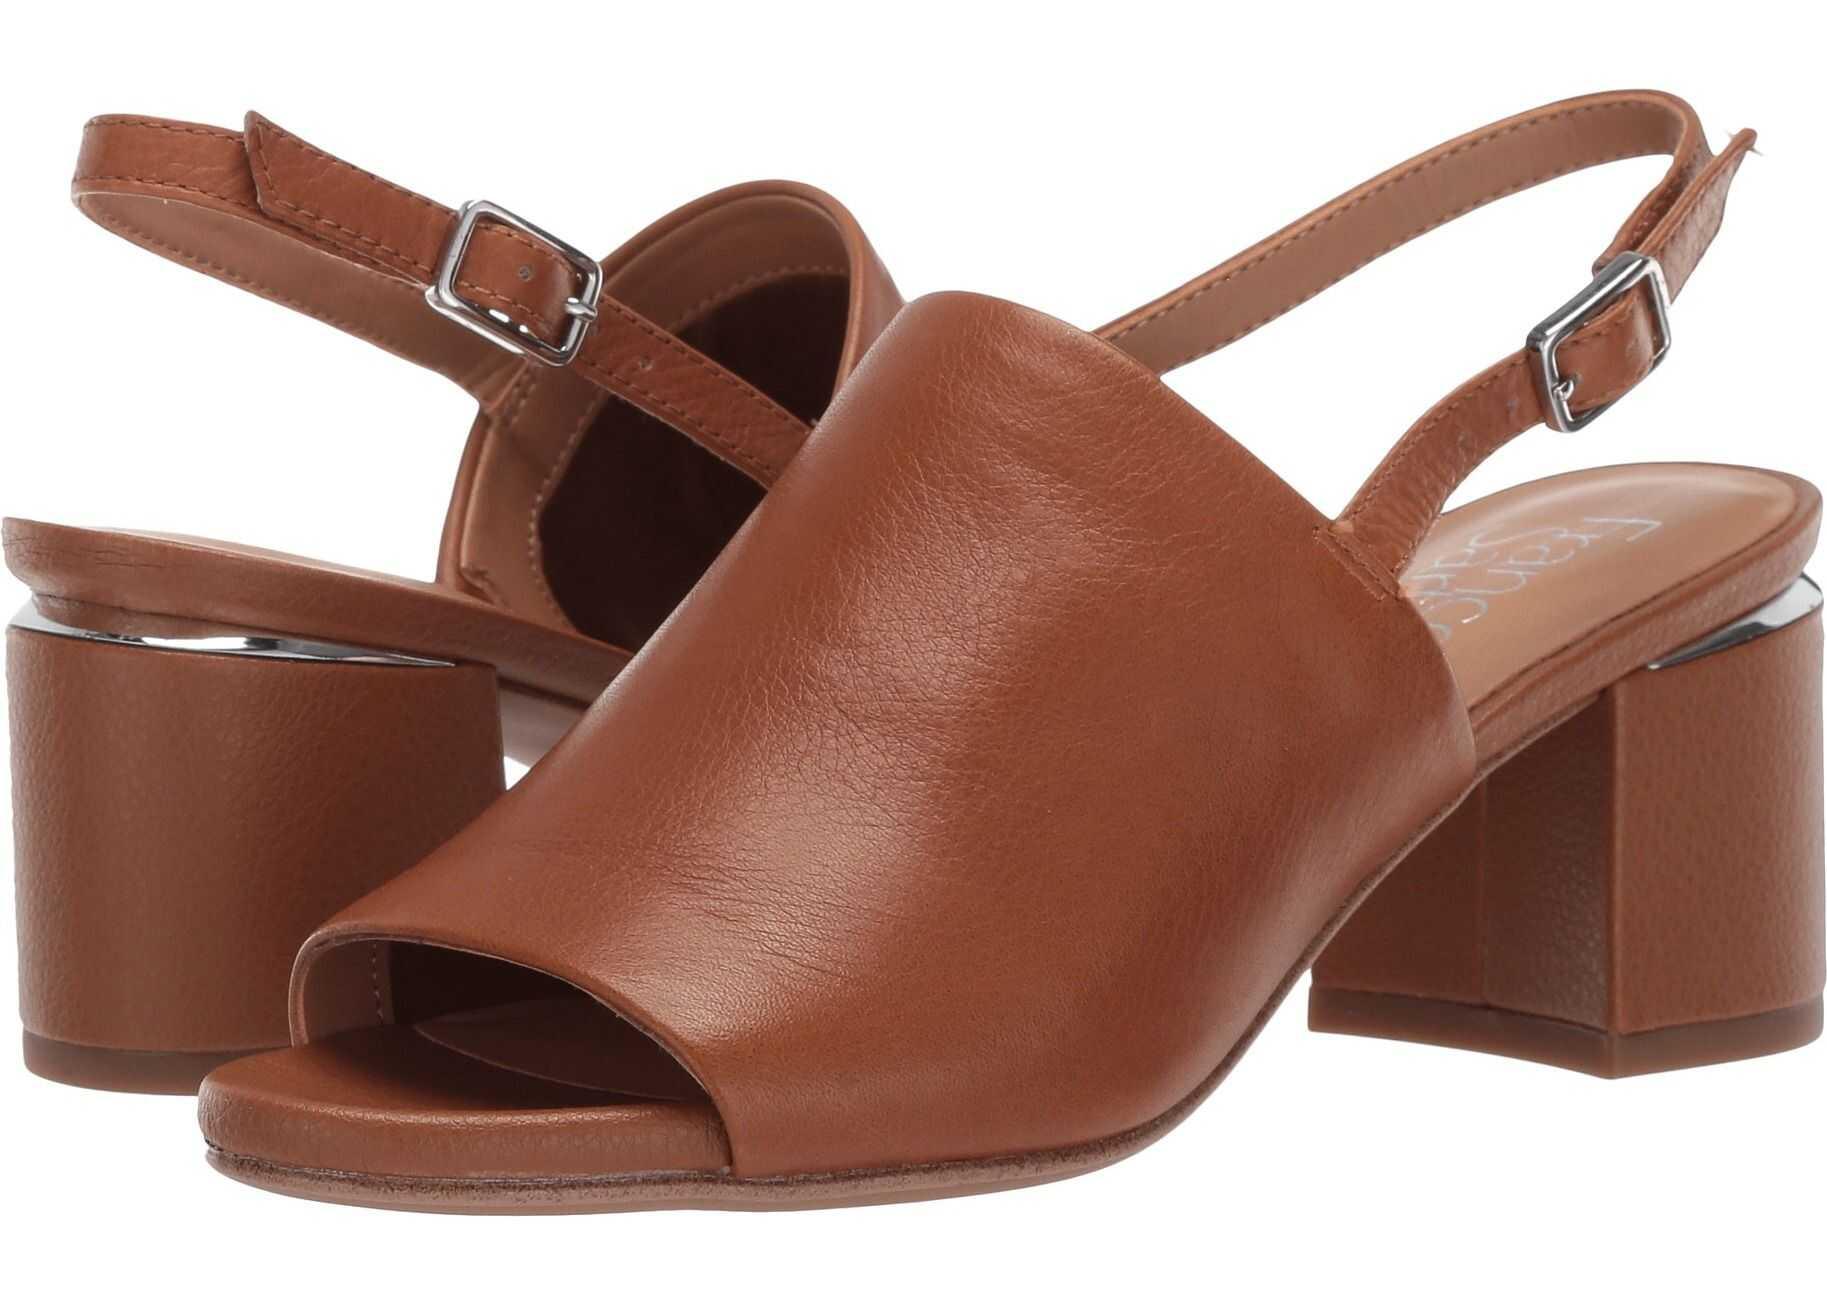 Franco Sarto Marielle Light Brown Leather